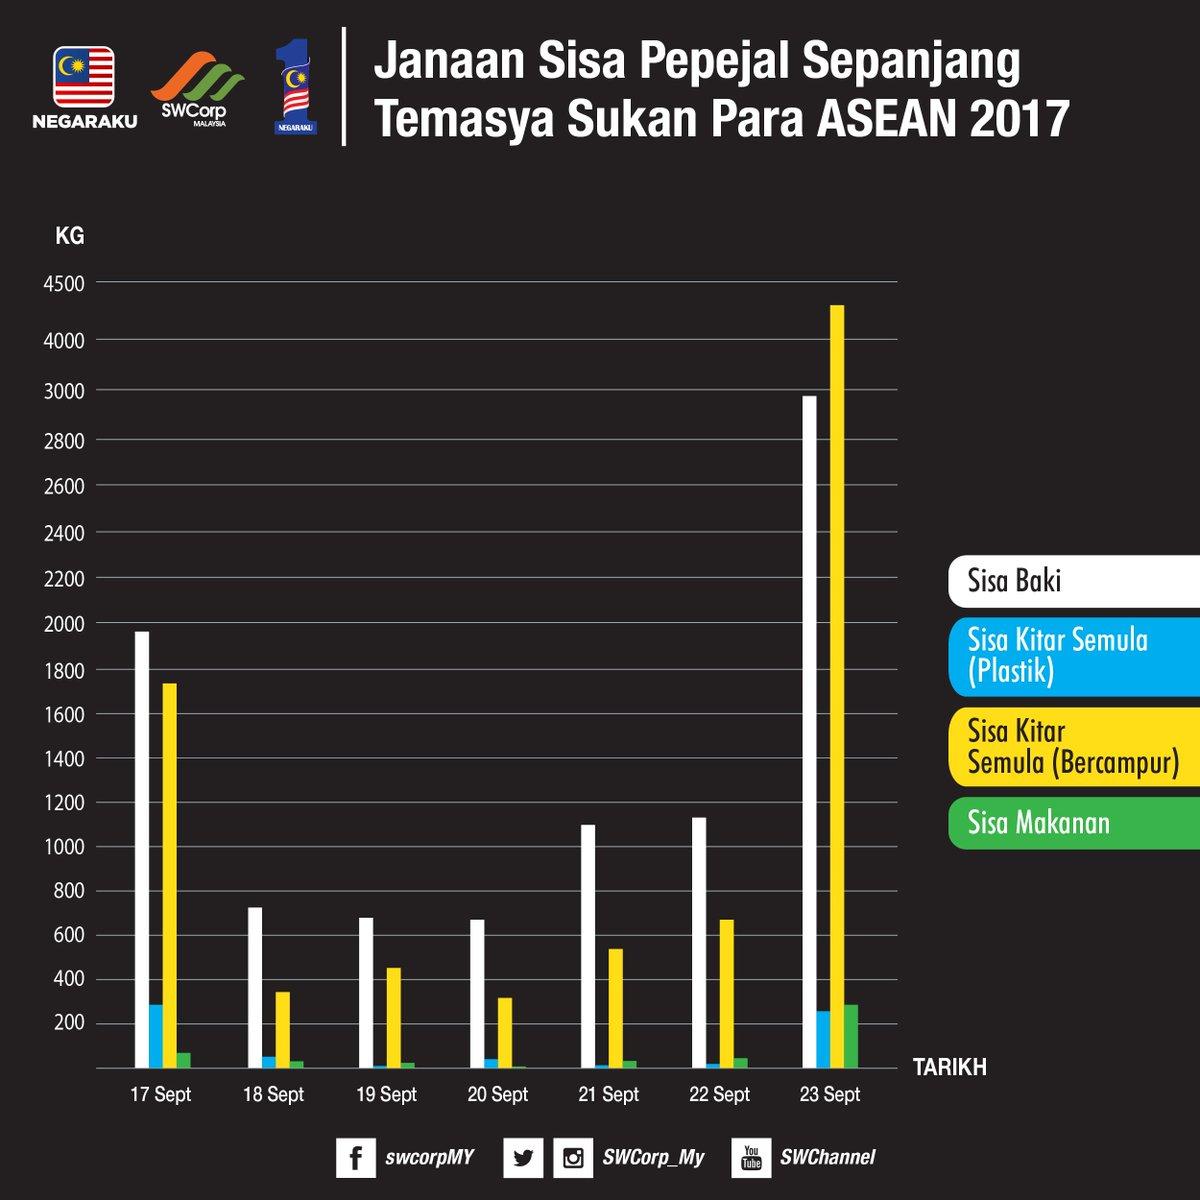 Swcorp On Twitter Statistik Penjanaan 4 Jenis Sisa Pepejal Sepanjang Sukan Para Asean 2017 Asingkan Keepitseparated Sas 3r Paraasean2017 Sukansea Https T Co Bvdkflrcmq